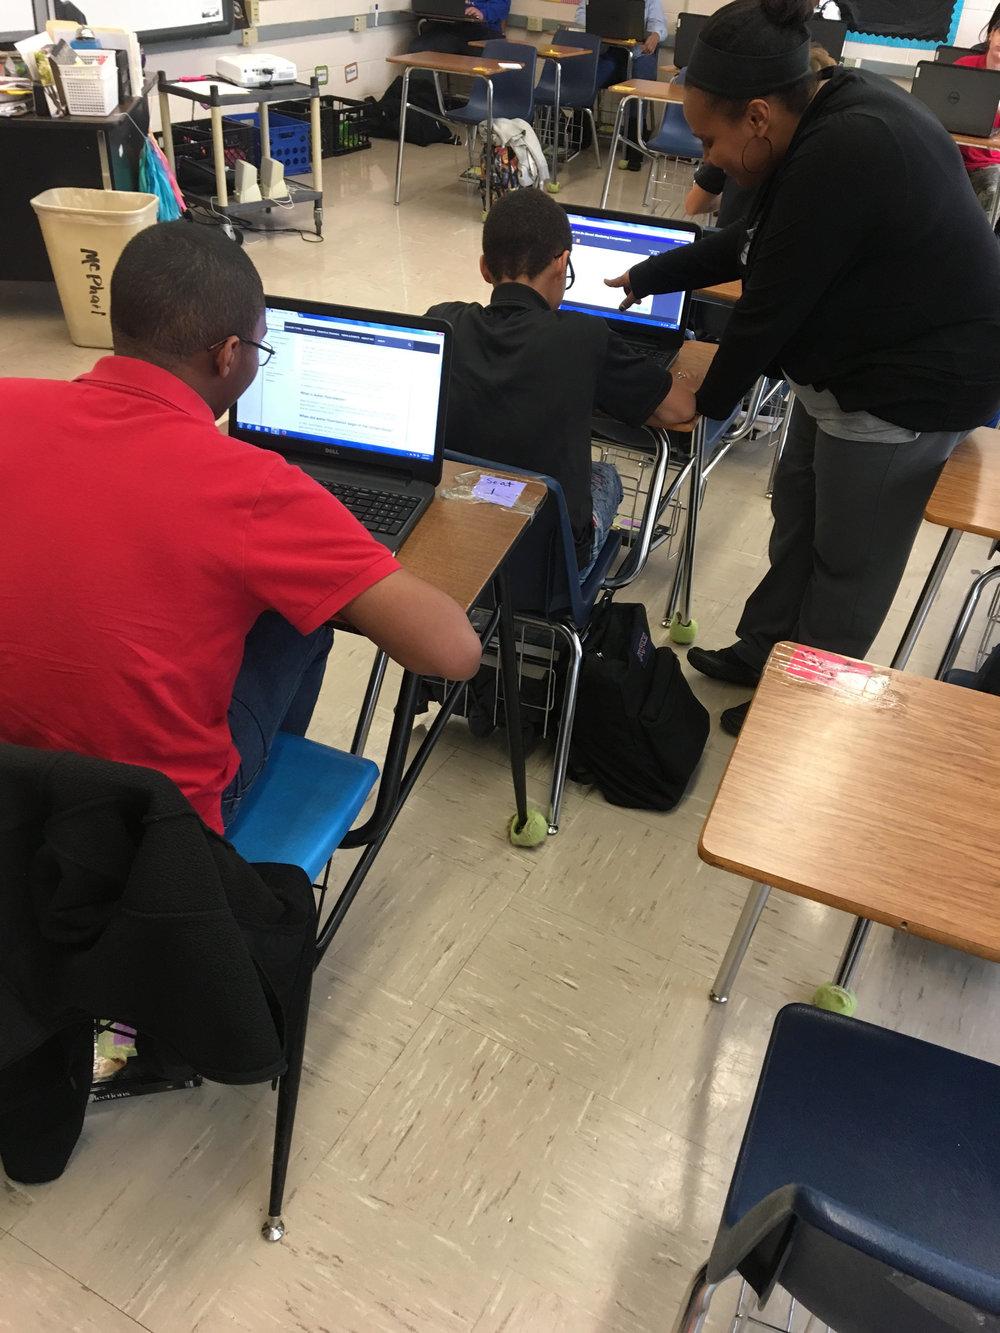 Melishia Brooks leans over to help a student.